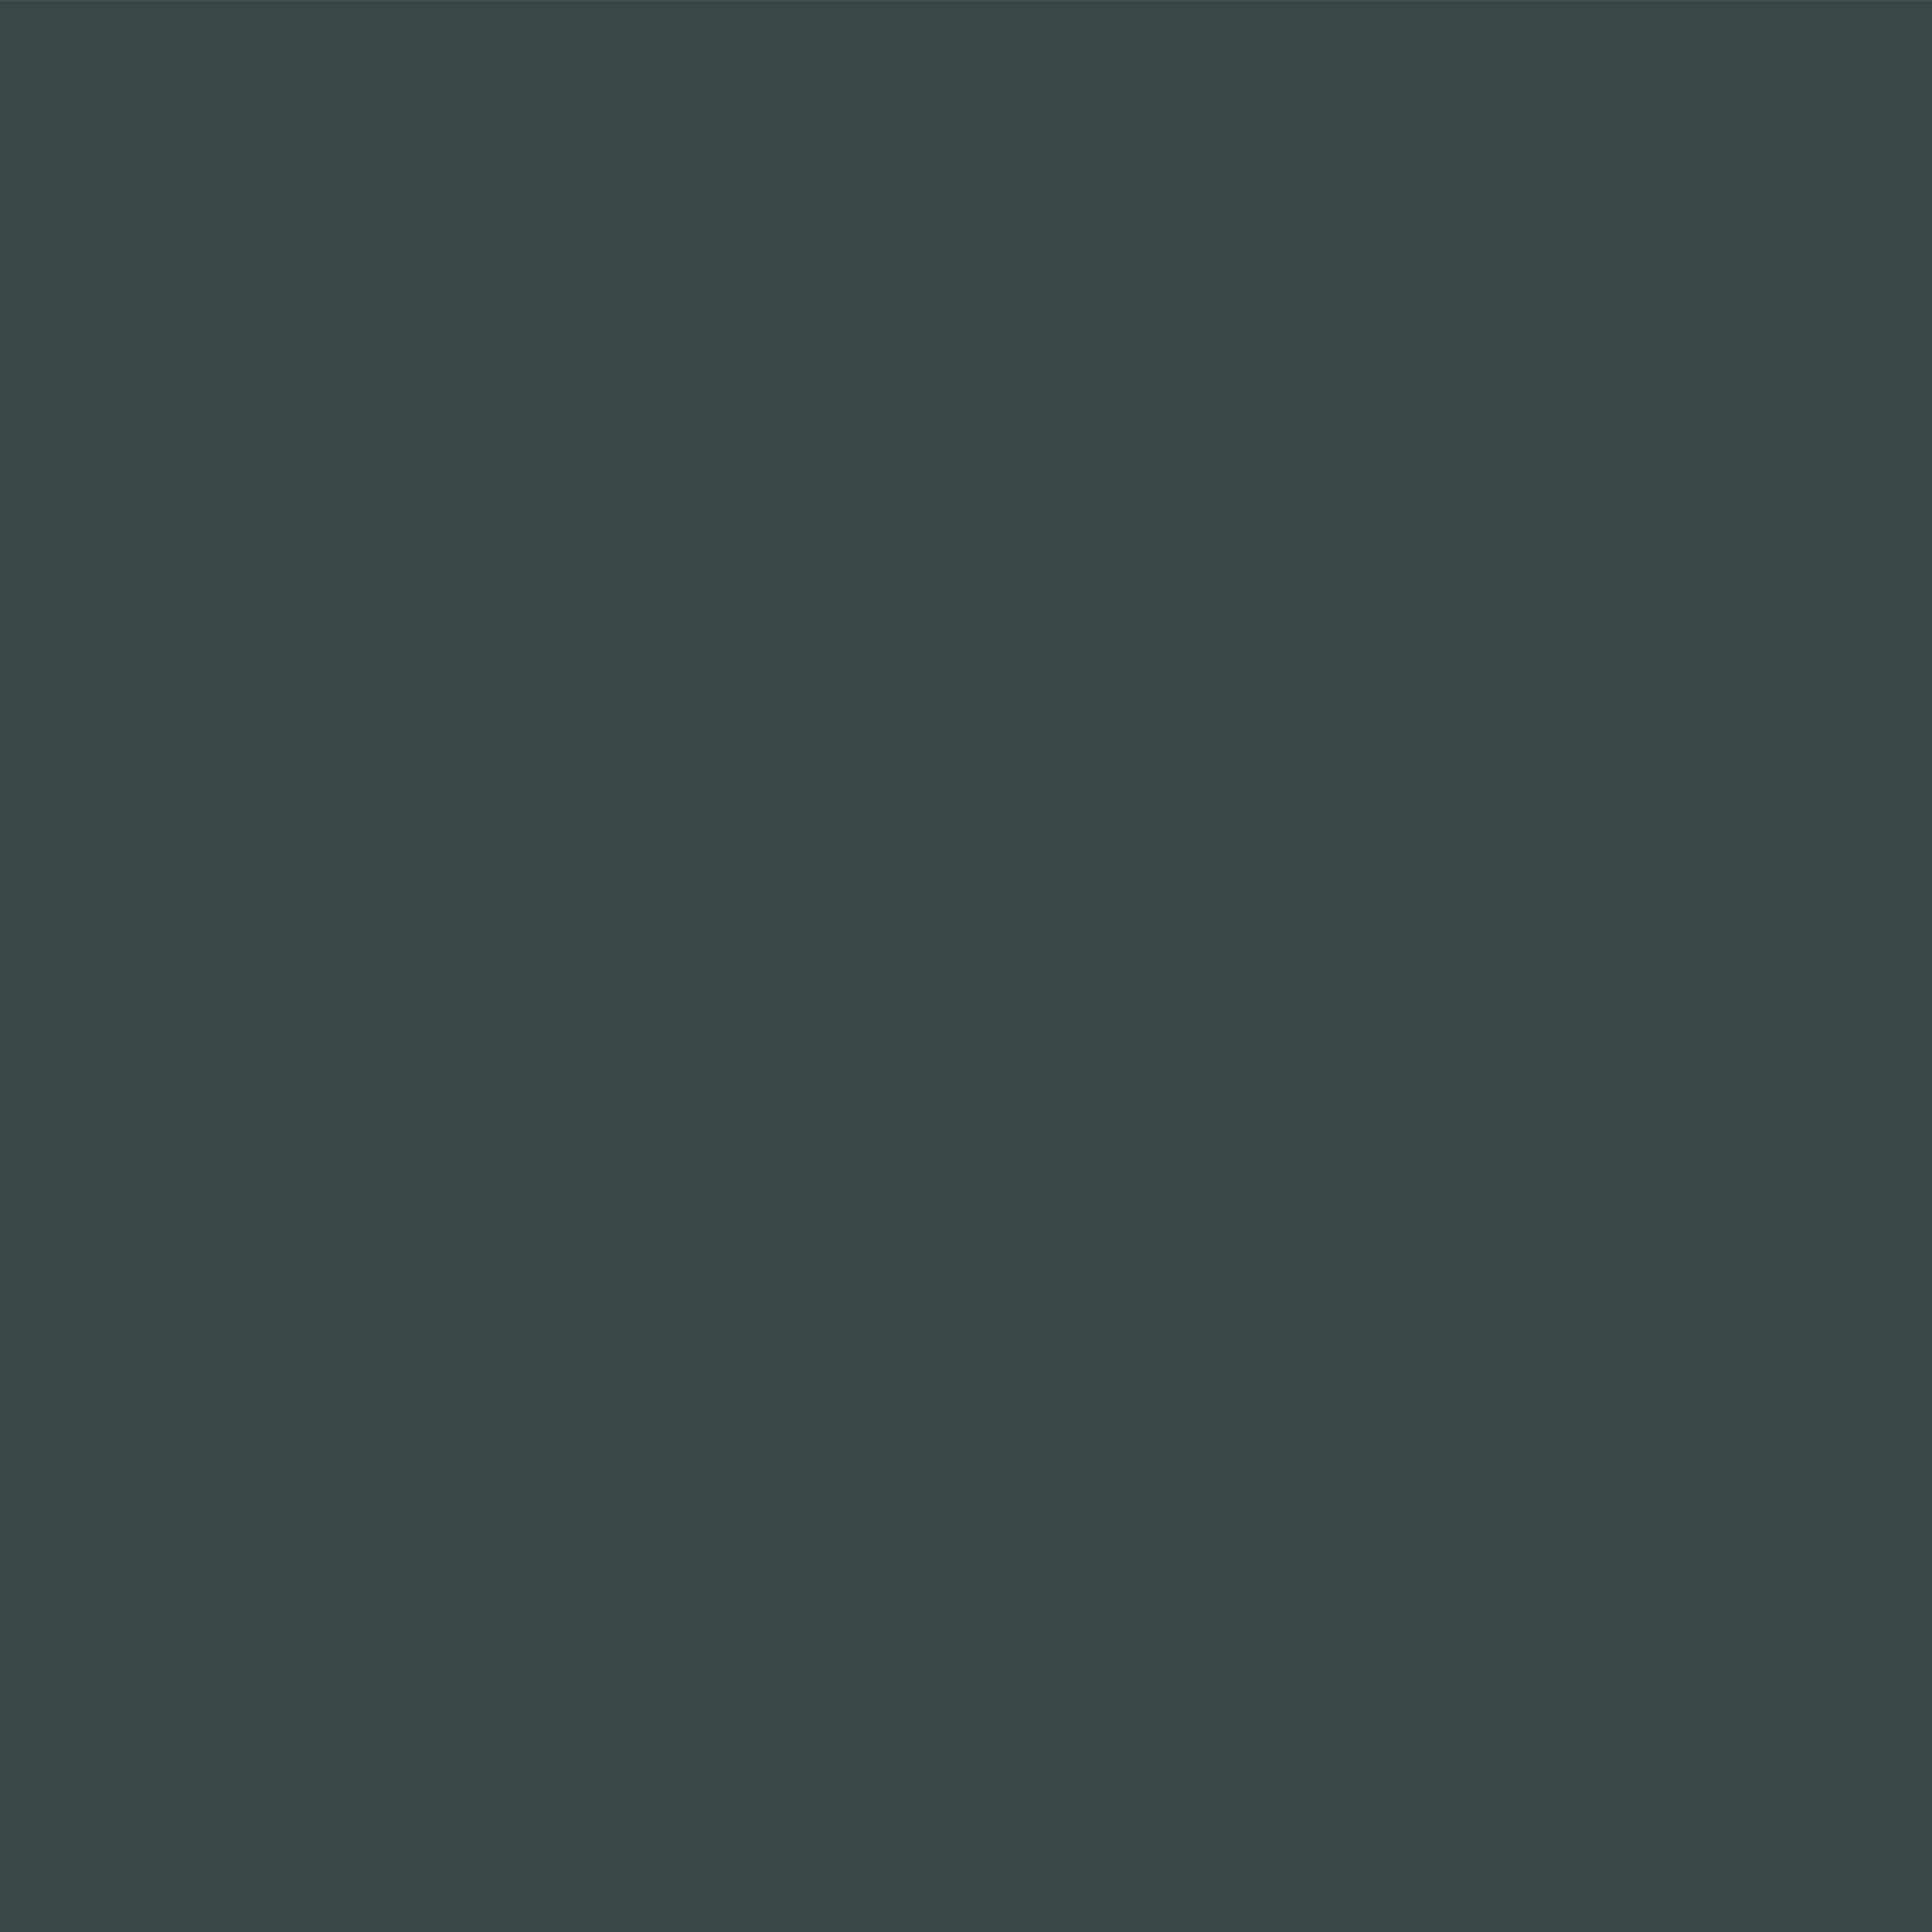 K70.0.0 Slate Grey